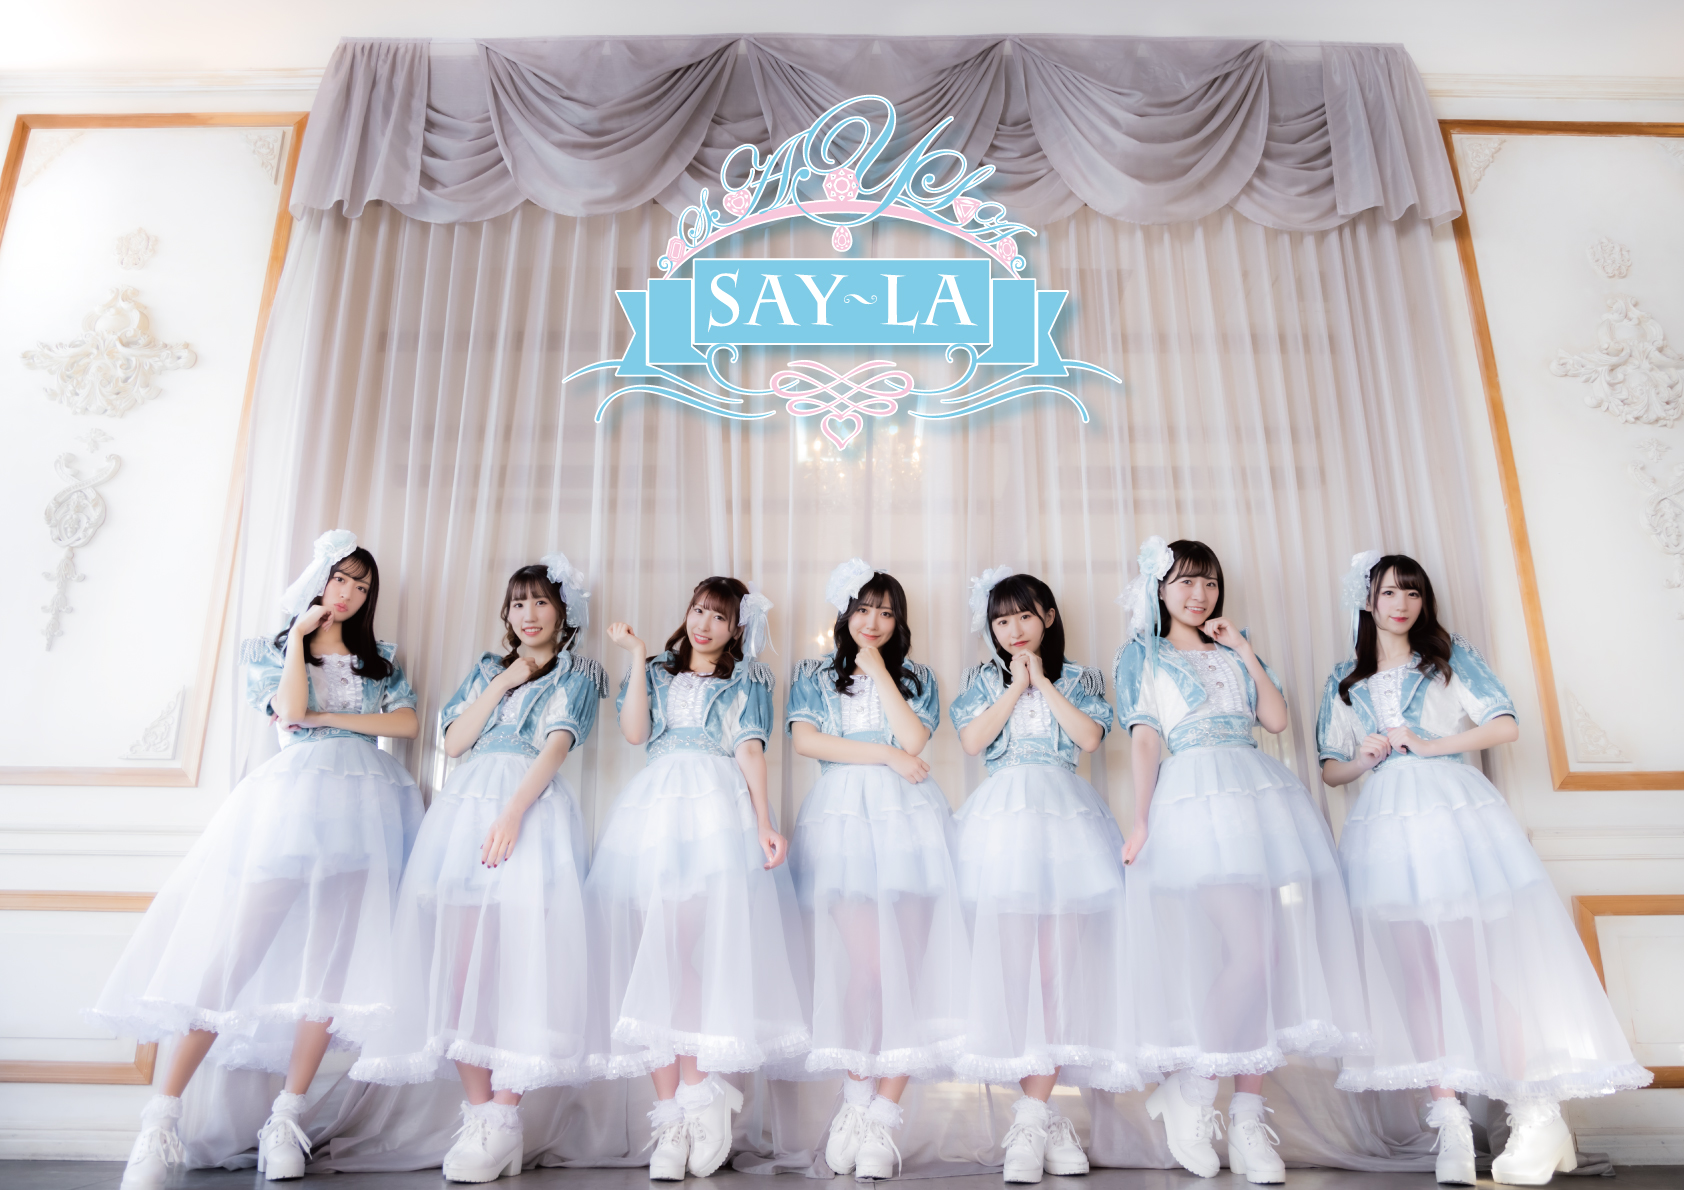 4月25日(日) SAY-LA 不定期公演